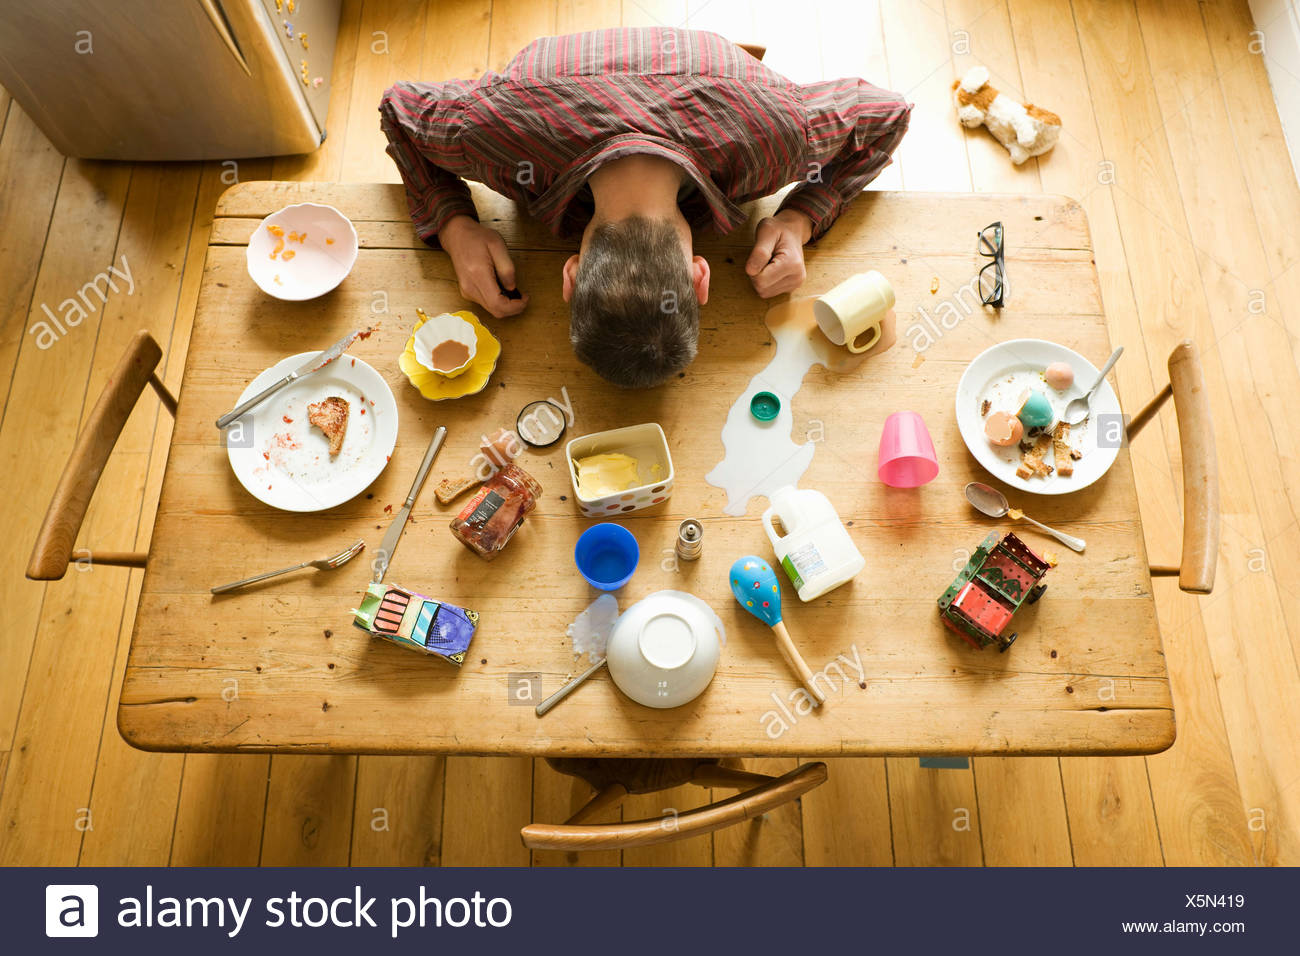 Draufsicht der Frühstückstisch mit reifer Mann unter chaotisch Platten Stockbild